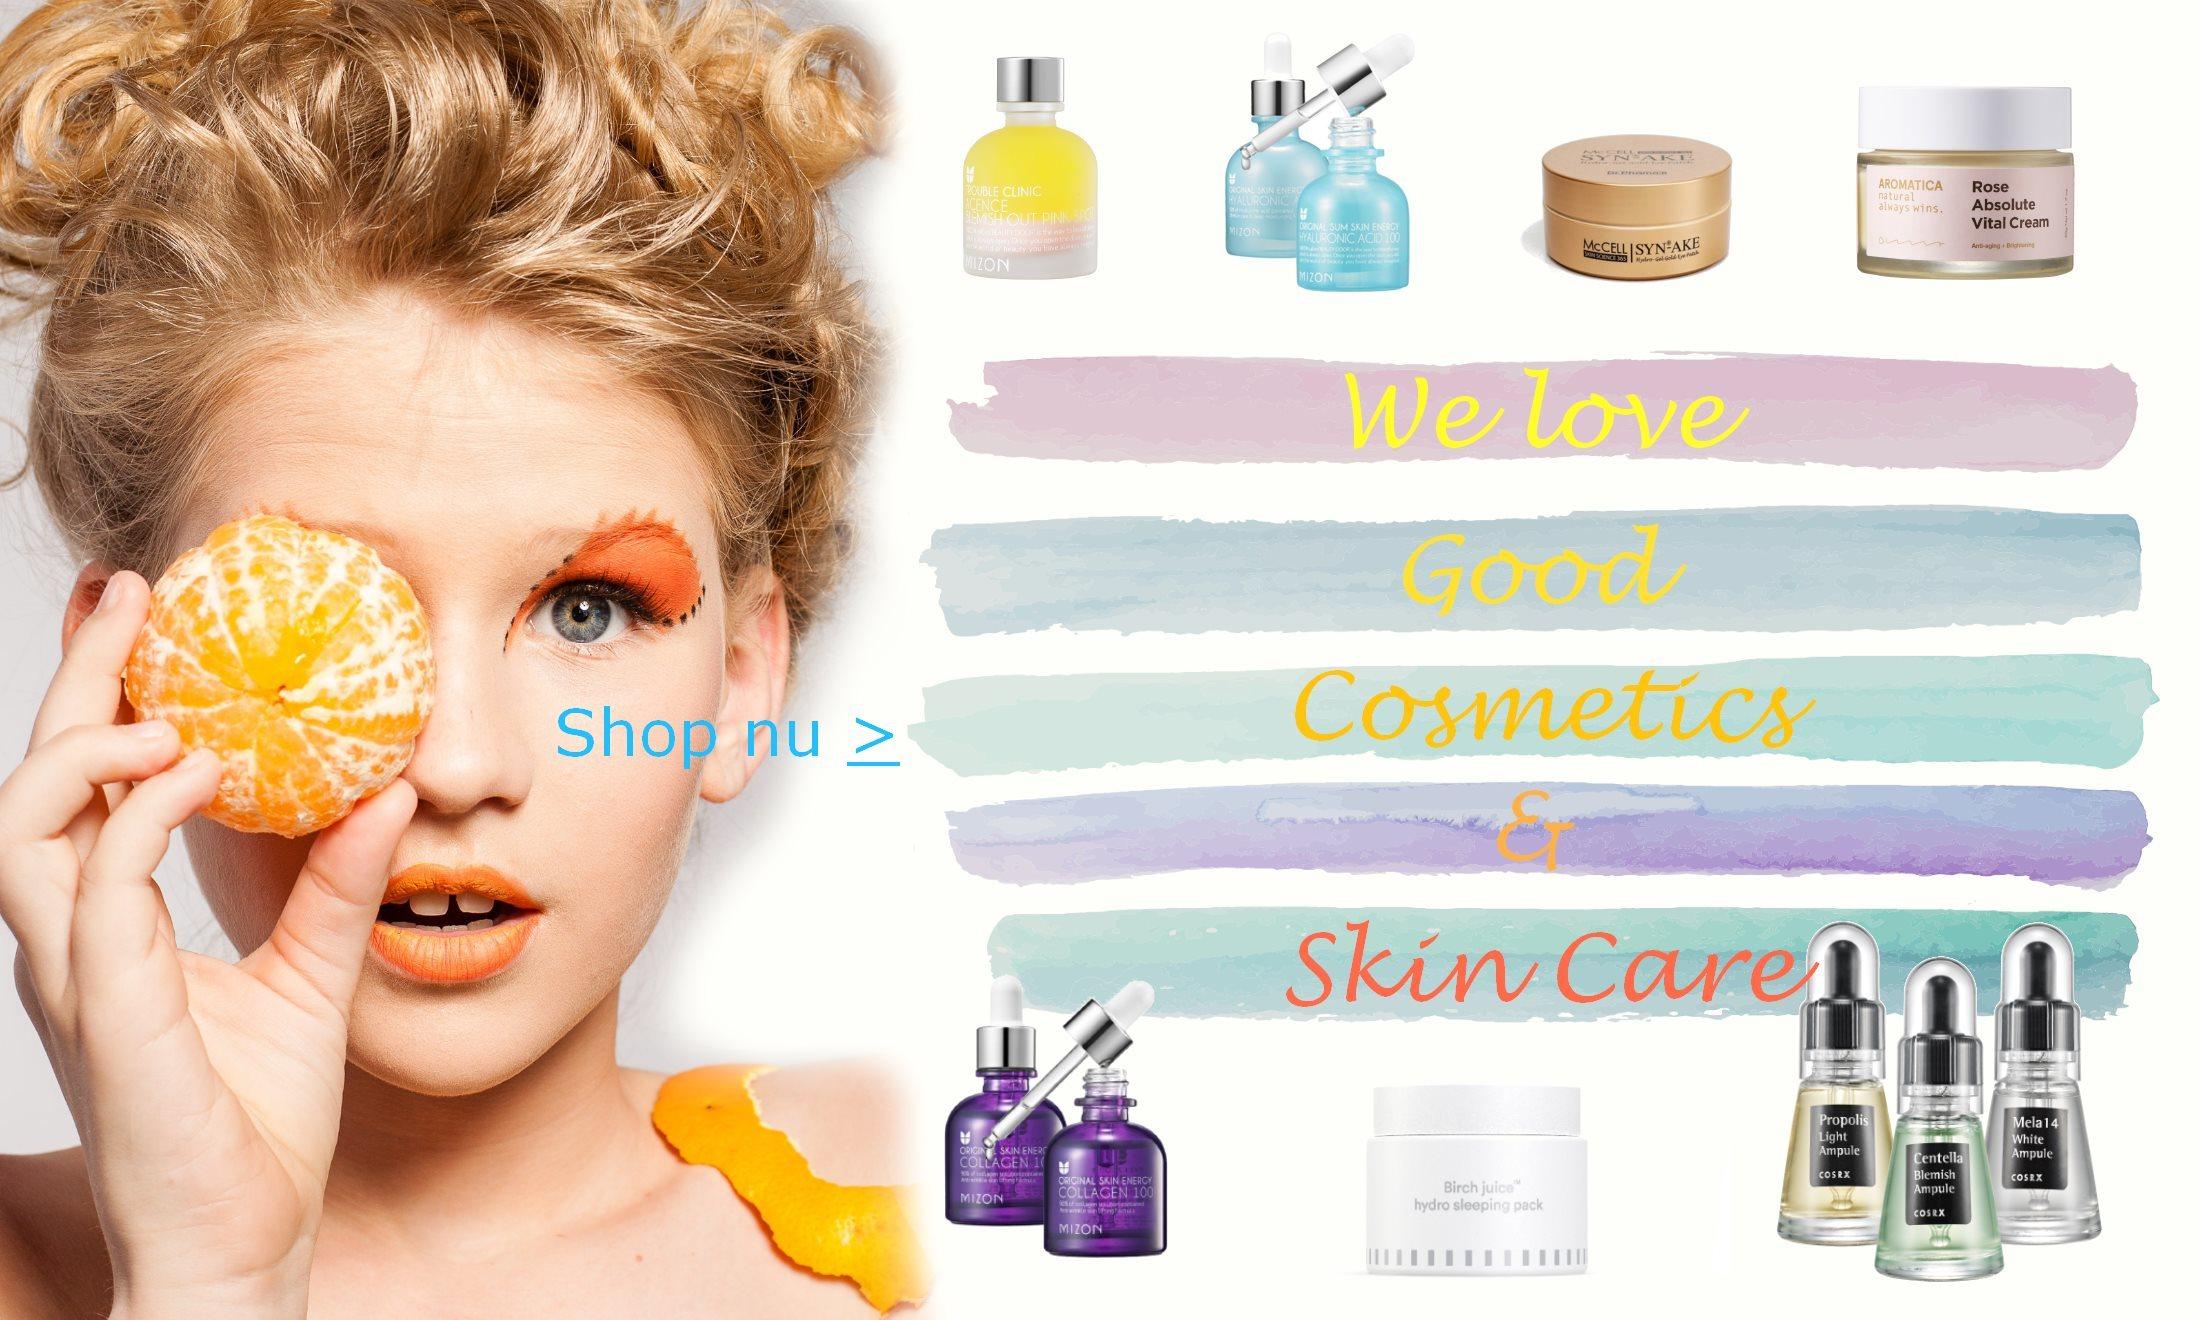 Goede Cosmetica & Skin Care